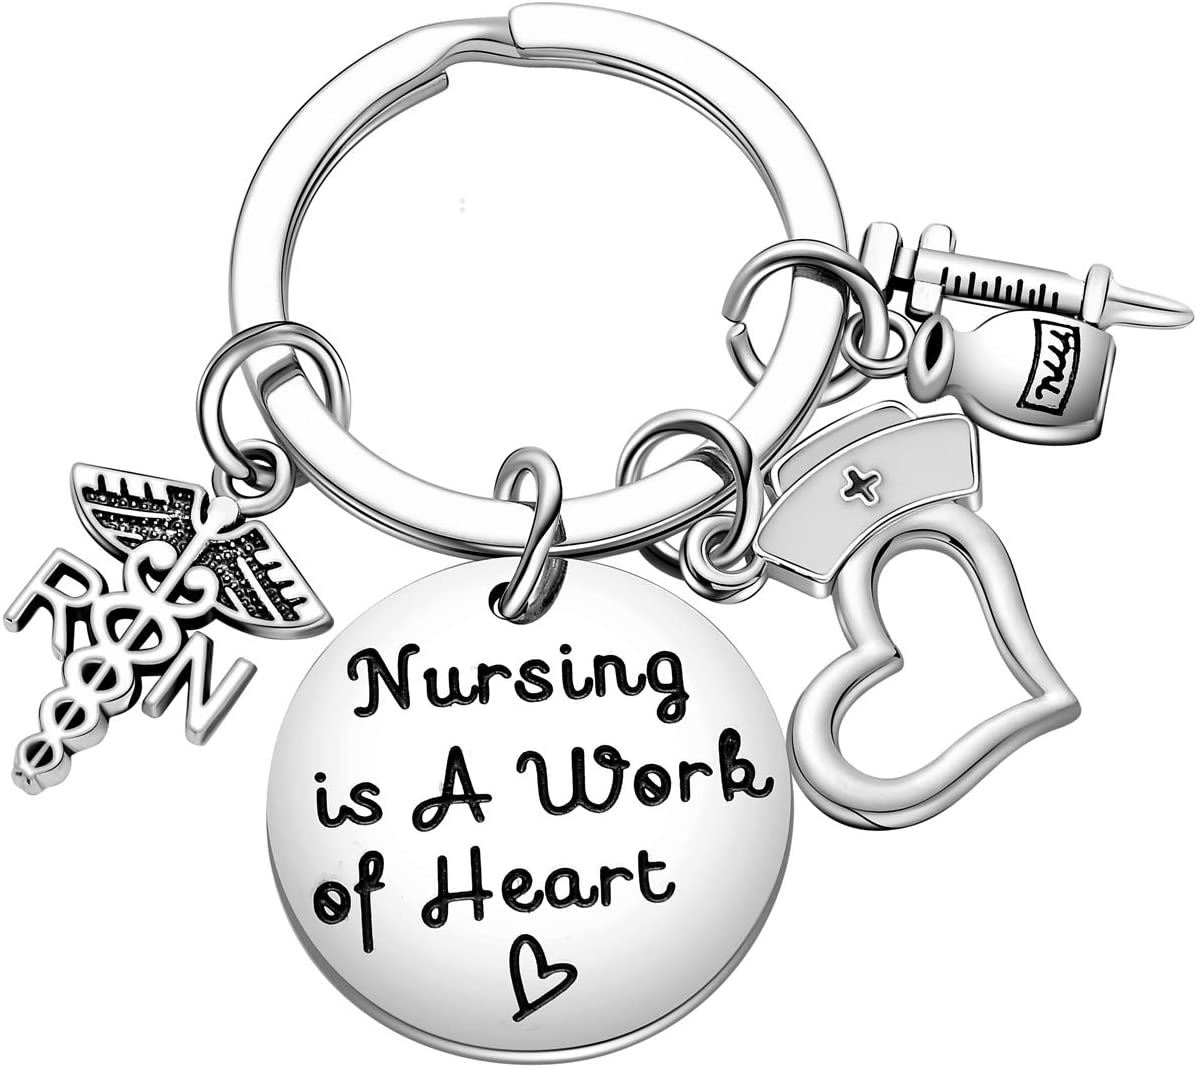 Nurse appreciation Nurse Valentine gifts Thank you gifts for nurses Heart keychain Registered nurse gifts LPN gifts Nurse keychain